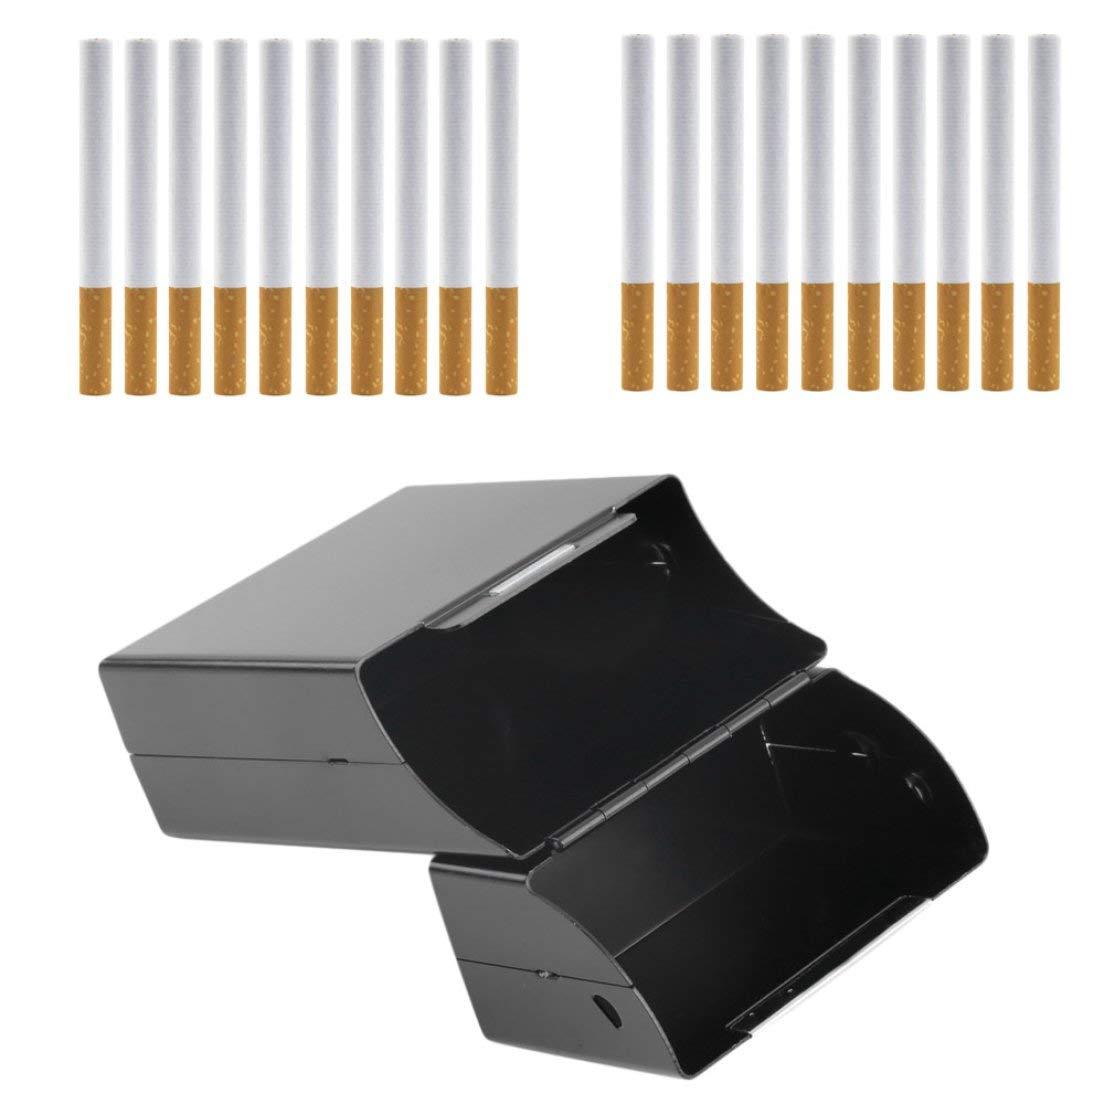 LouiseEvel215 Caja de Cigarrillos de Aluminio port/átil Estuche de Almacenamiento Duradero Ultra Fino para cigarros Accesorios de Cigarrillos Profesionales